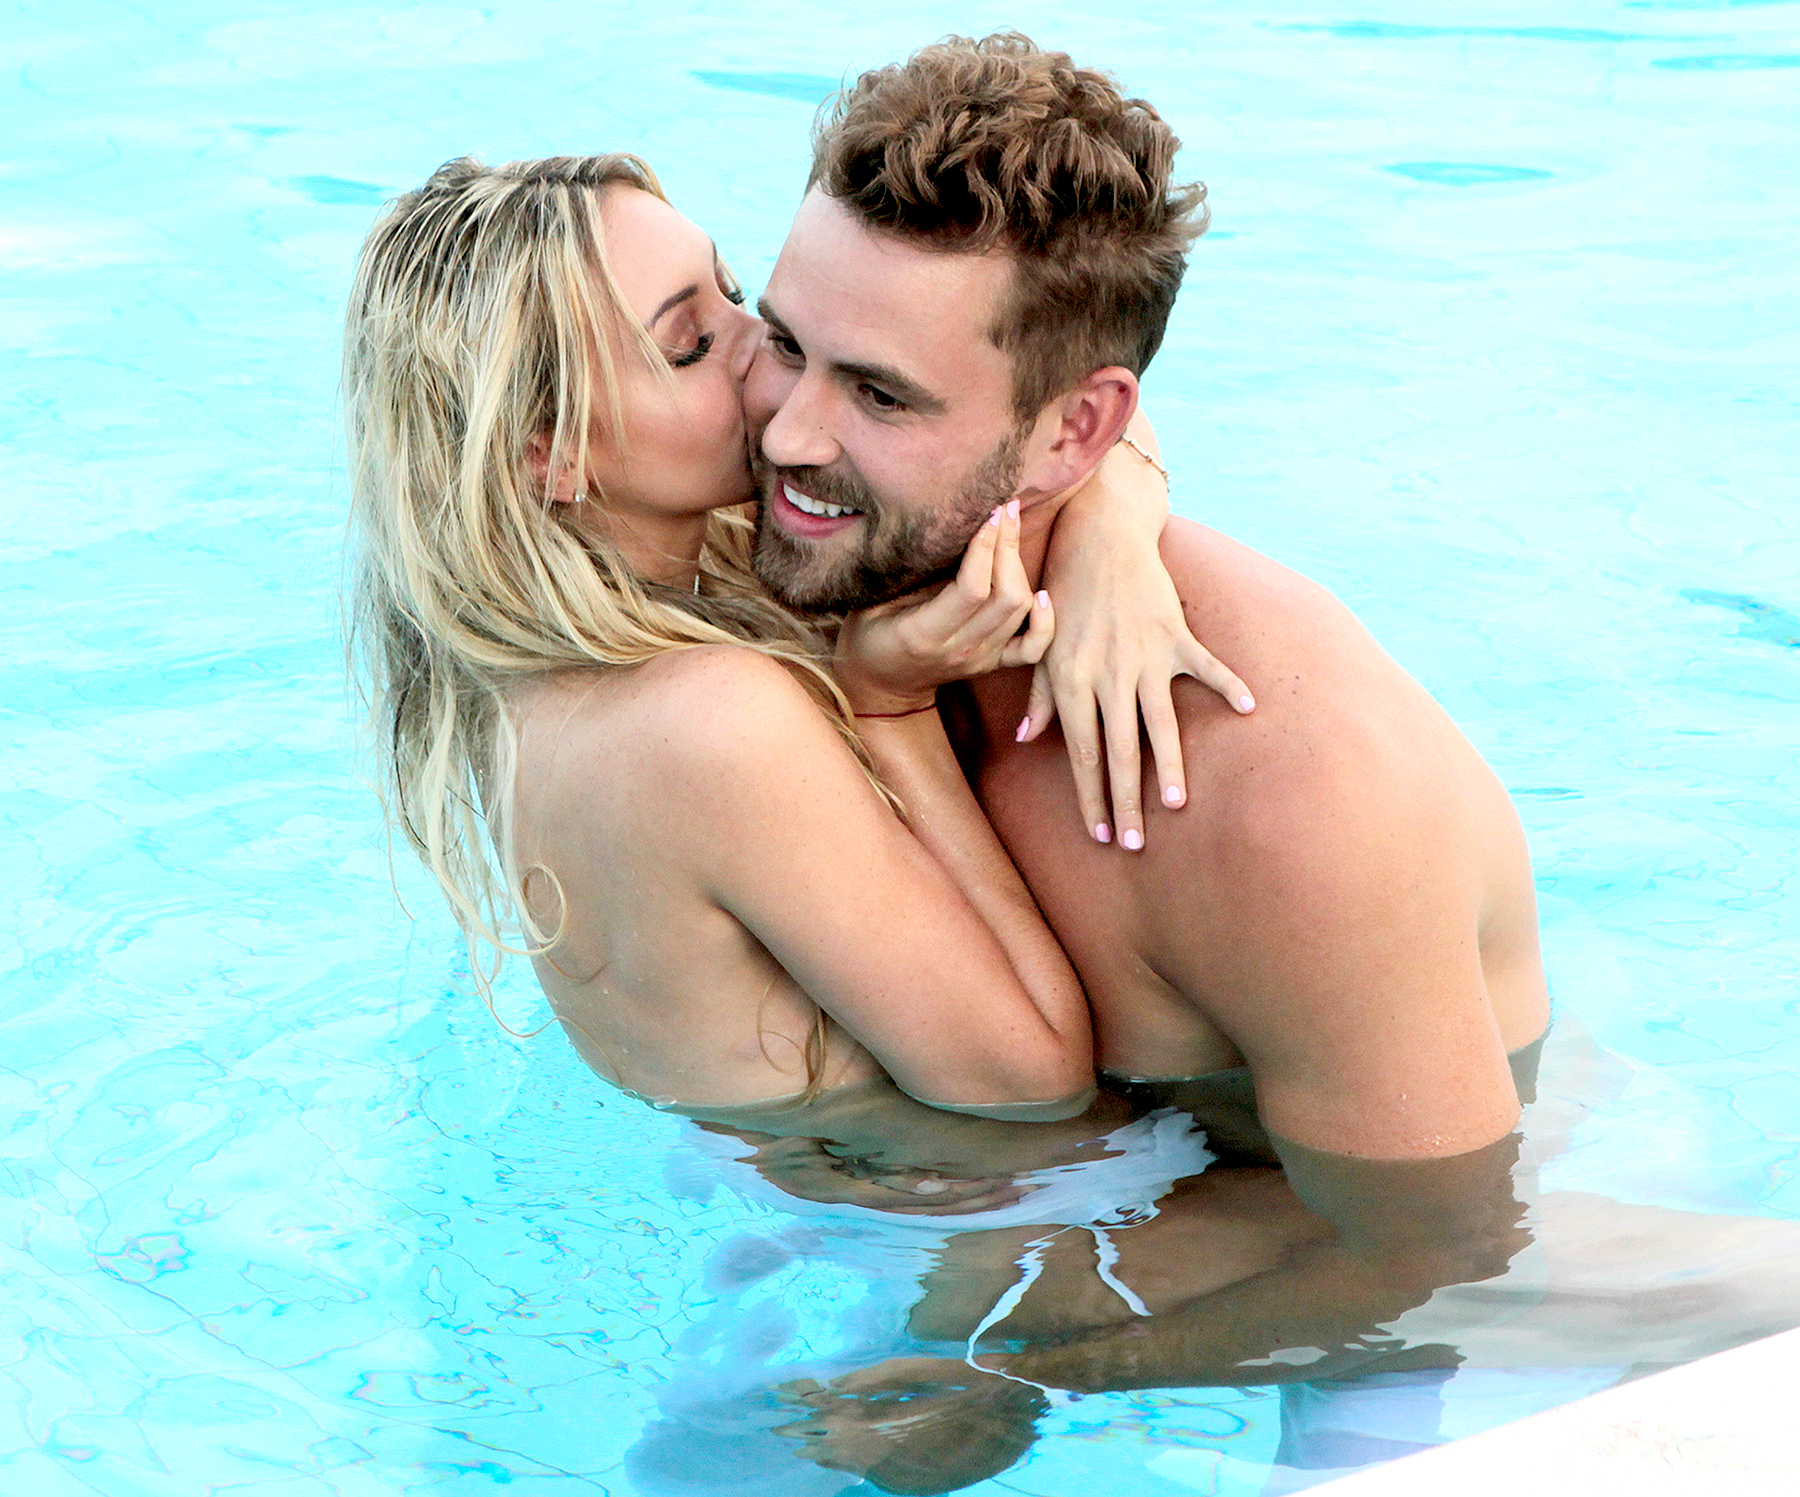 Corinne and Nick